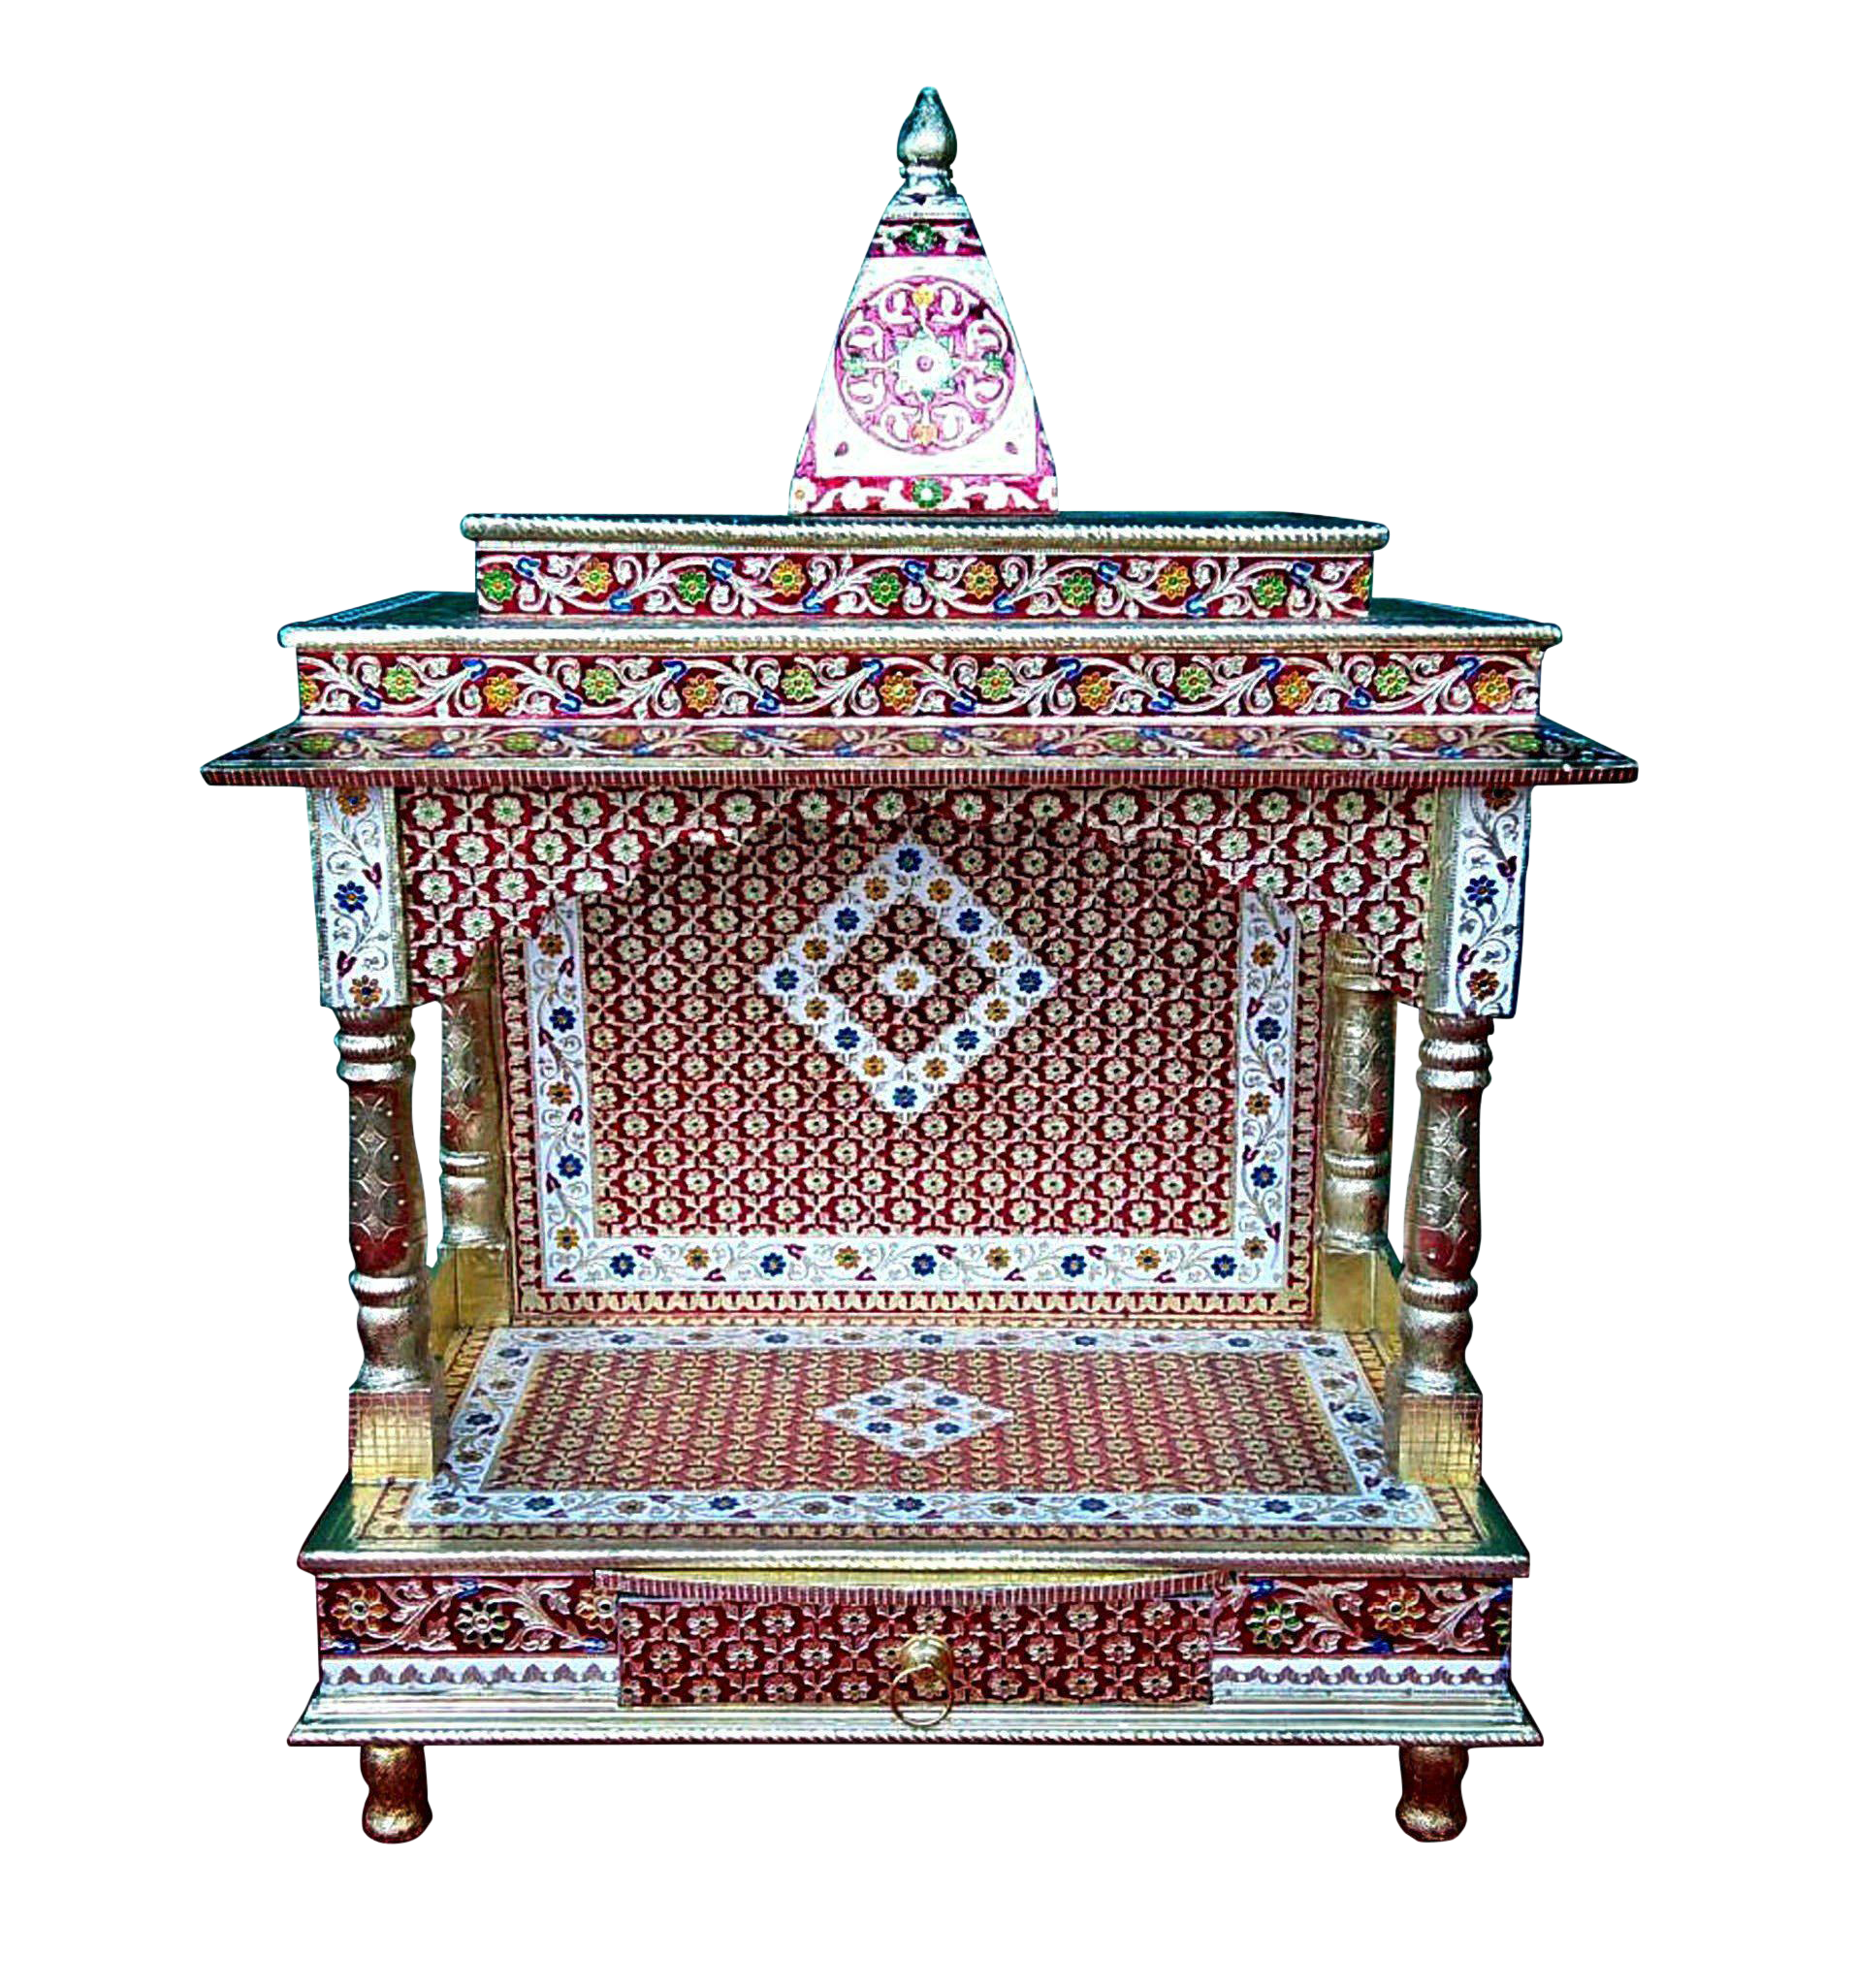 Meenakari Multicolor Home Puja Mandir Hindu Temple Mandapam Altar   Image 1  Of 3